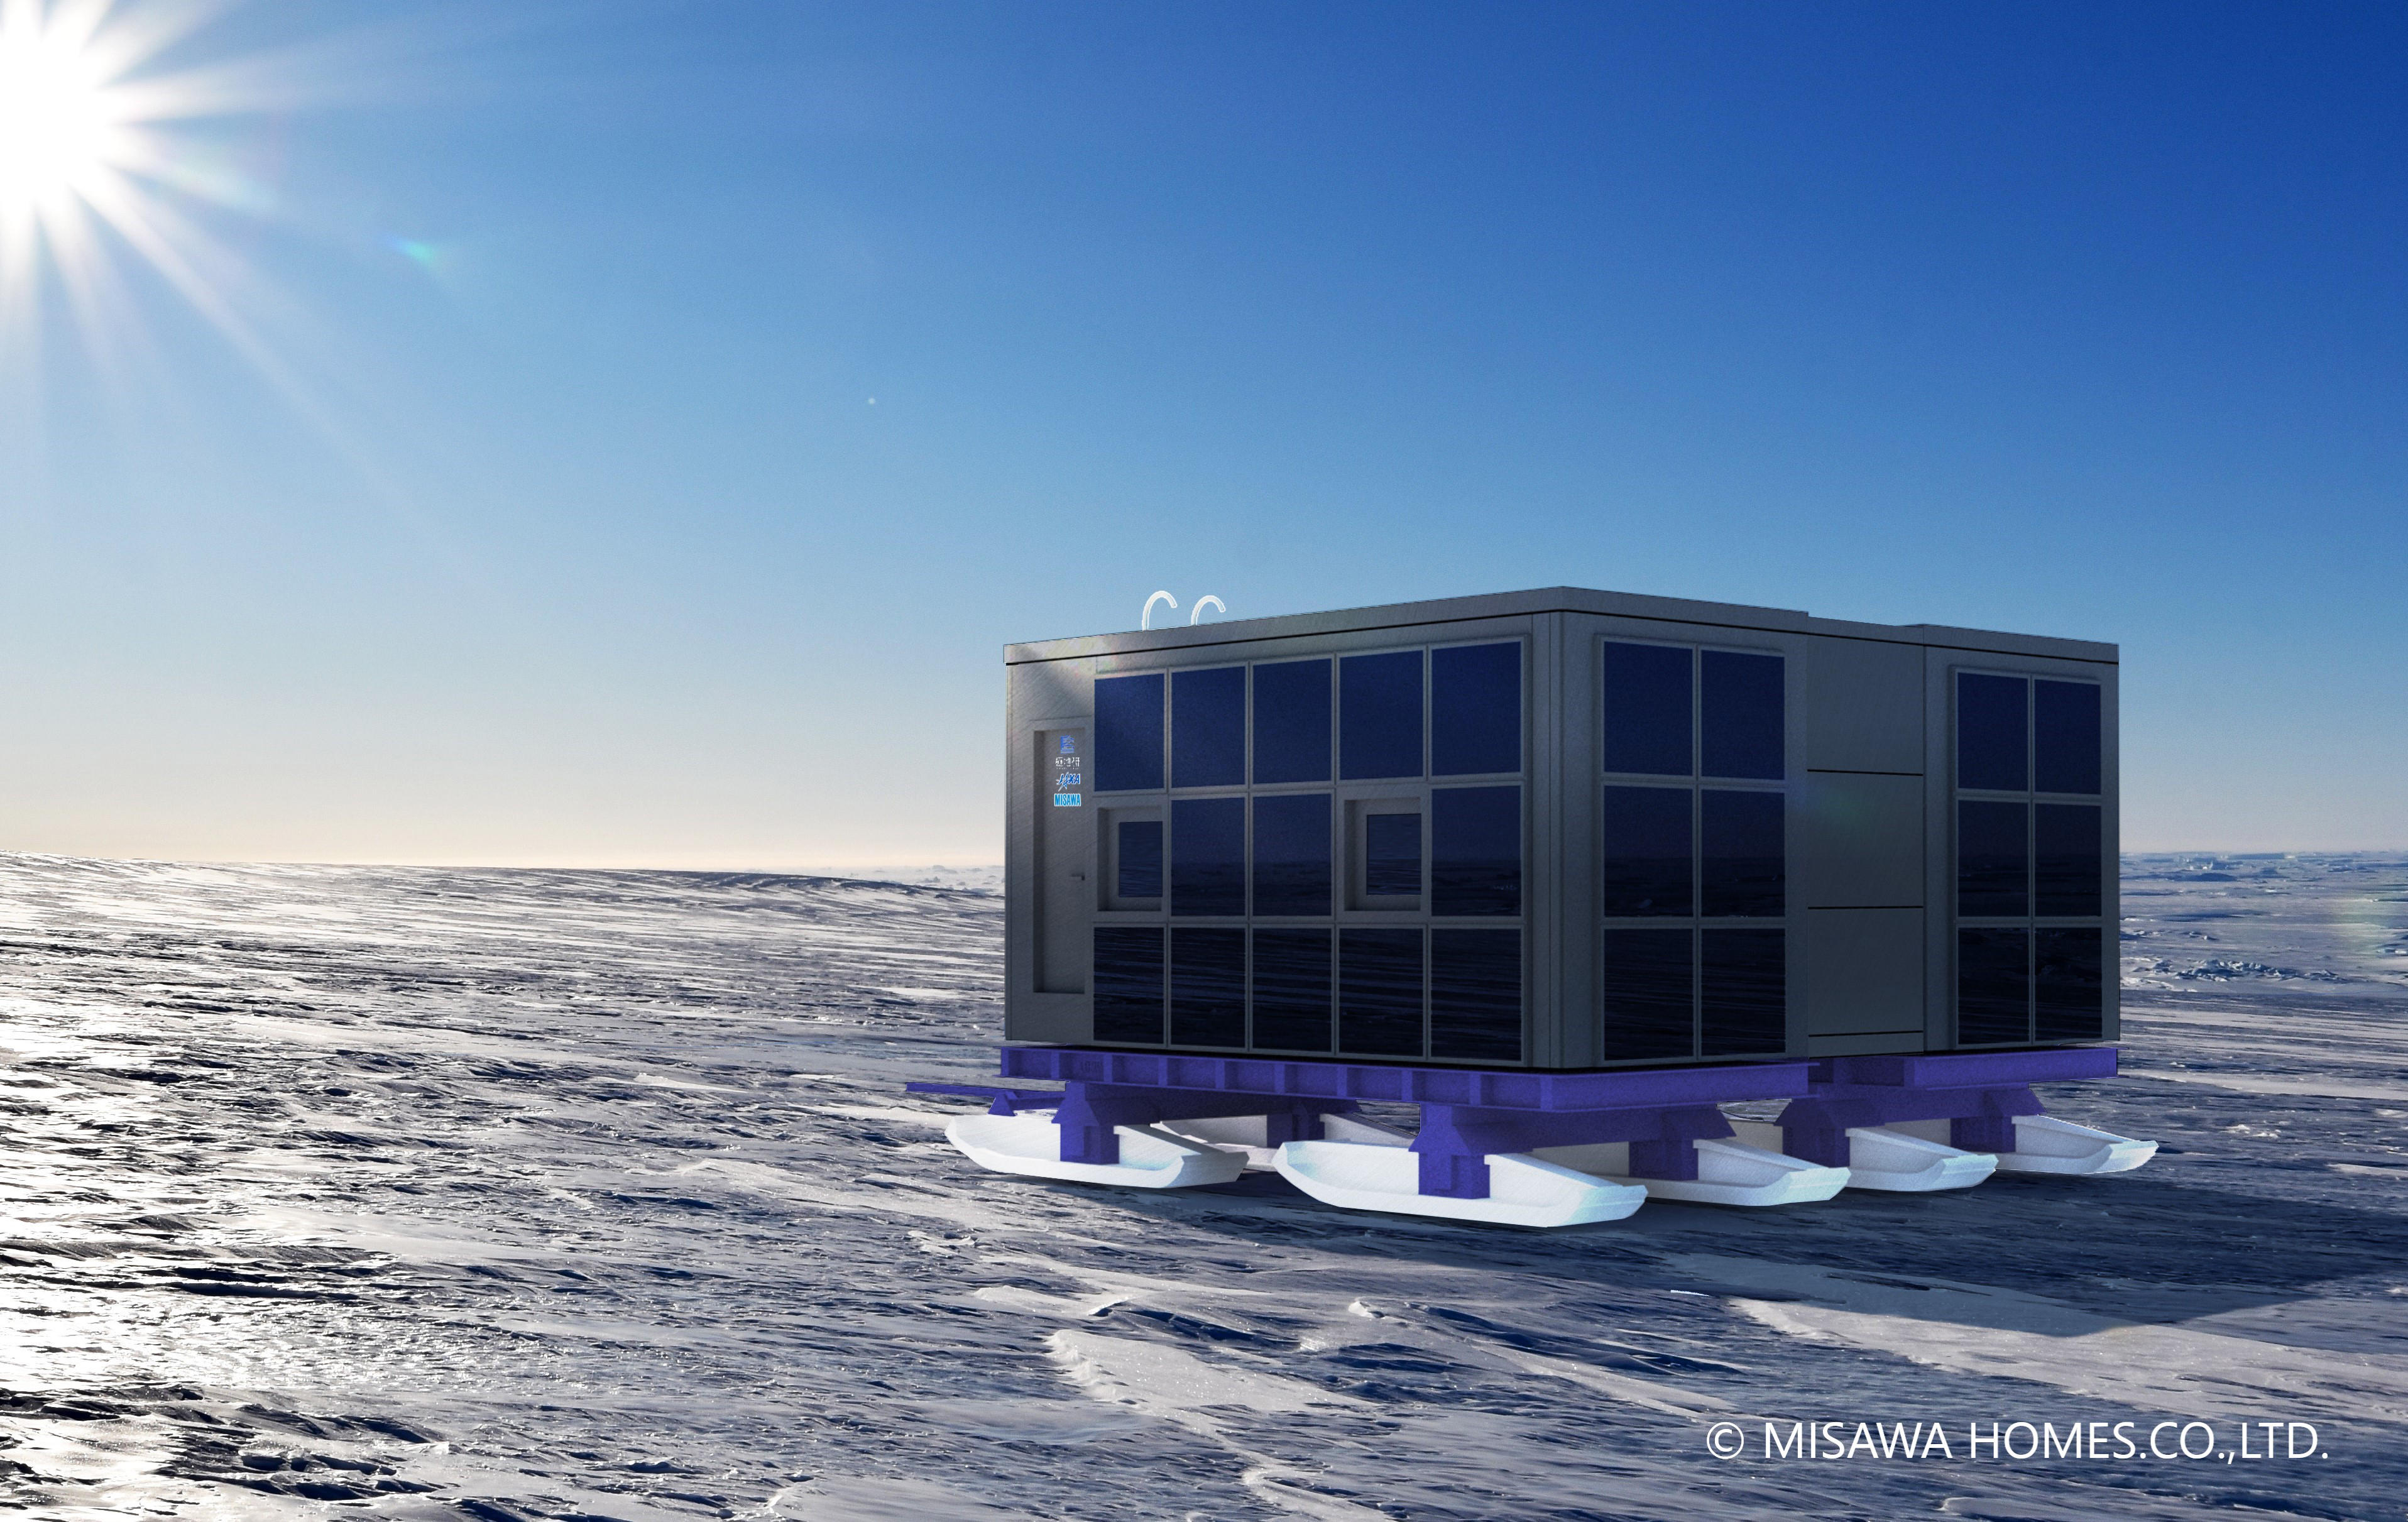 JAXAら4者 「南極移動基地ユニット」実証実験を実施